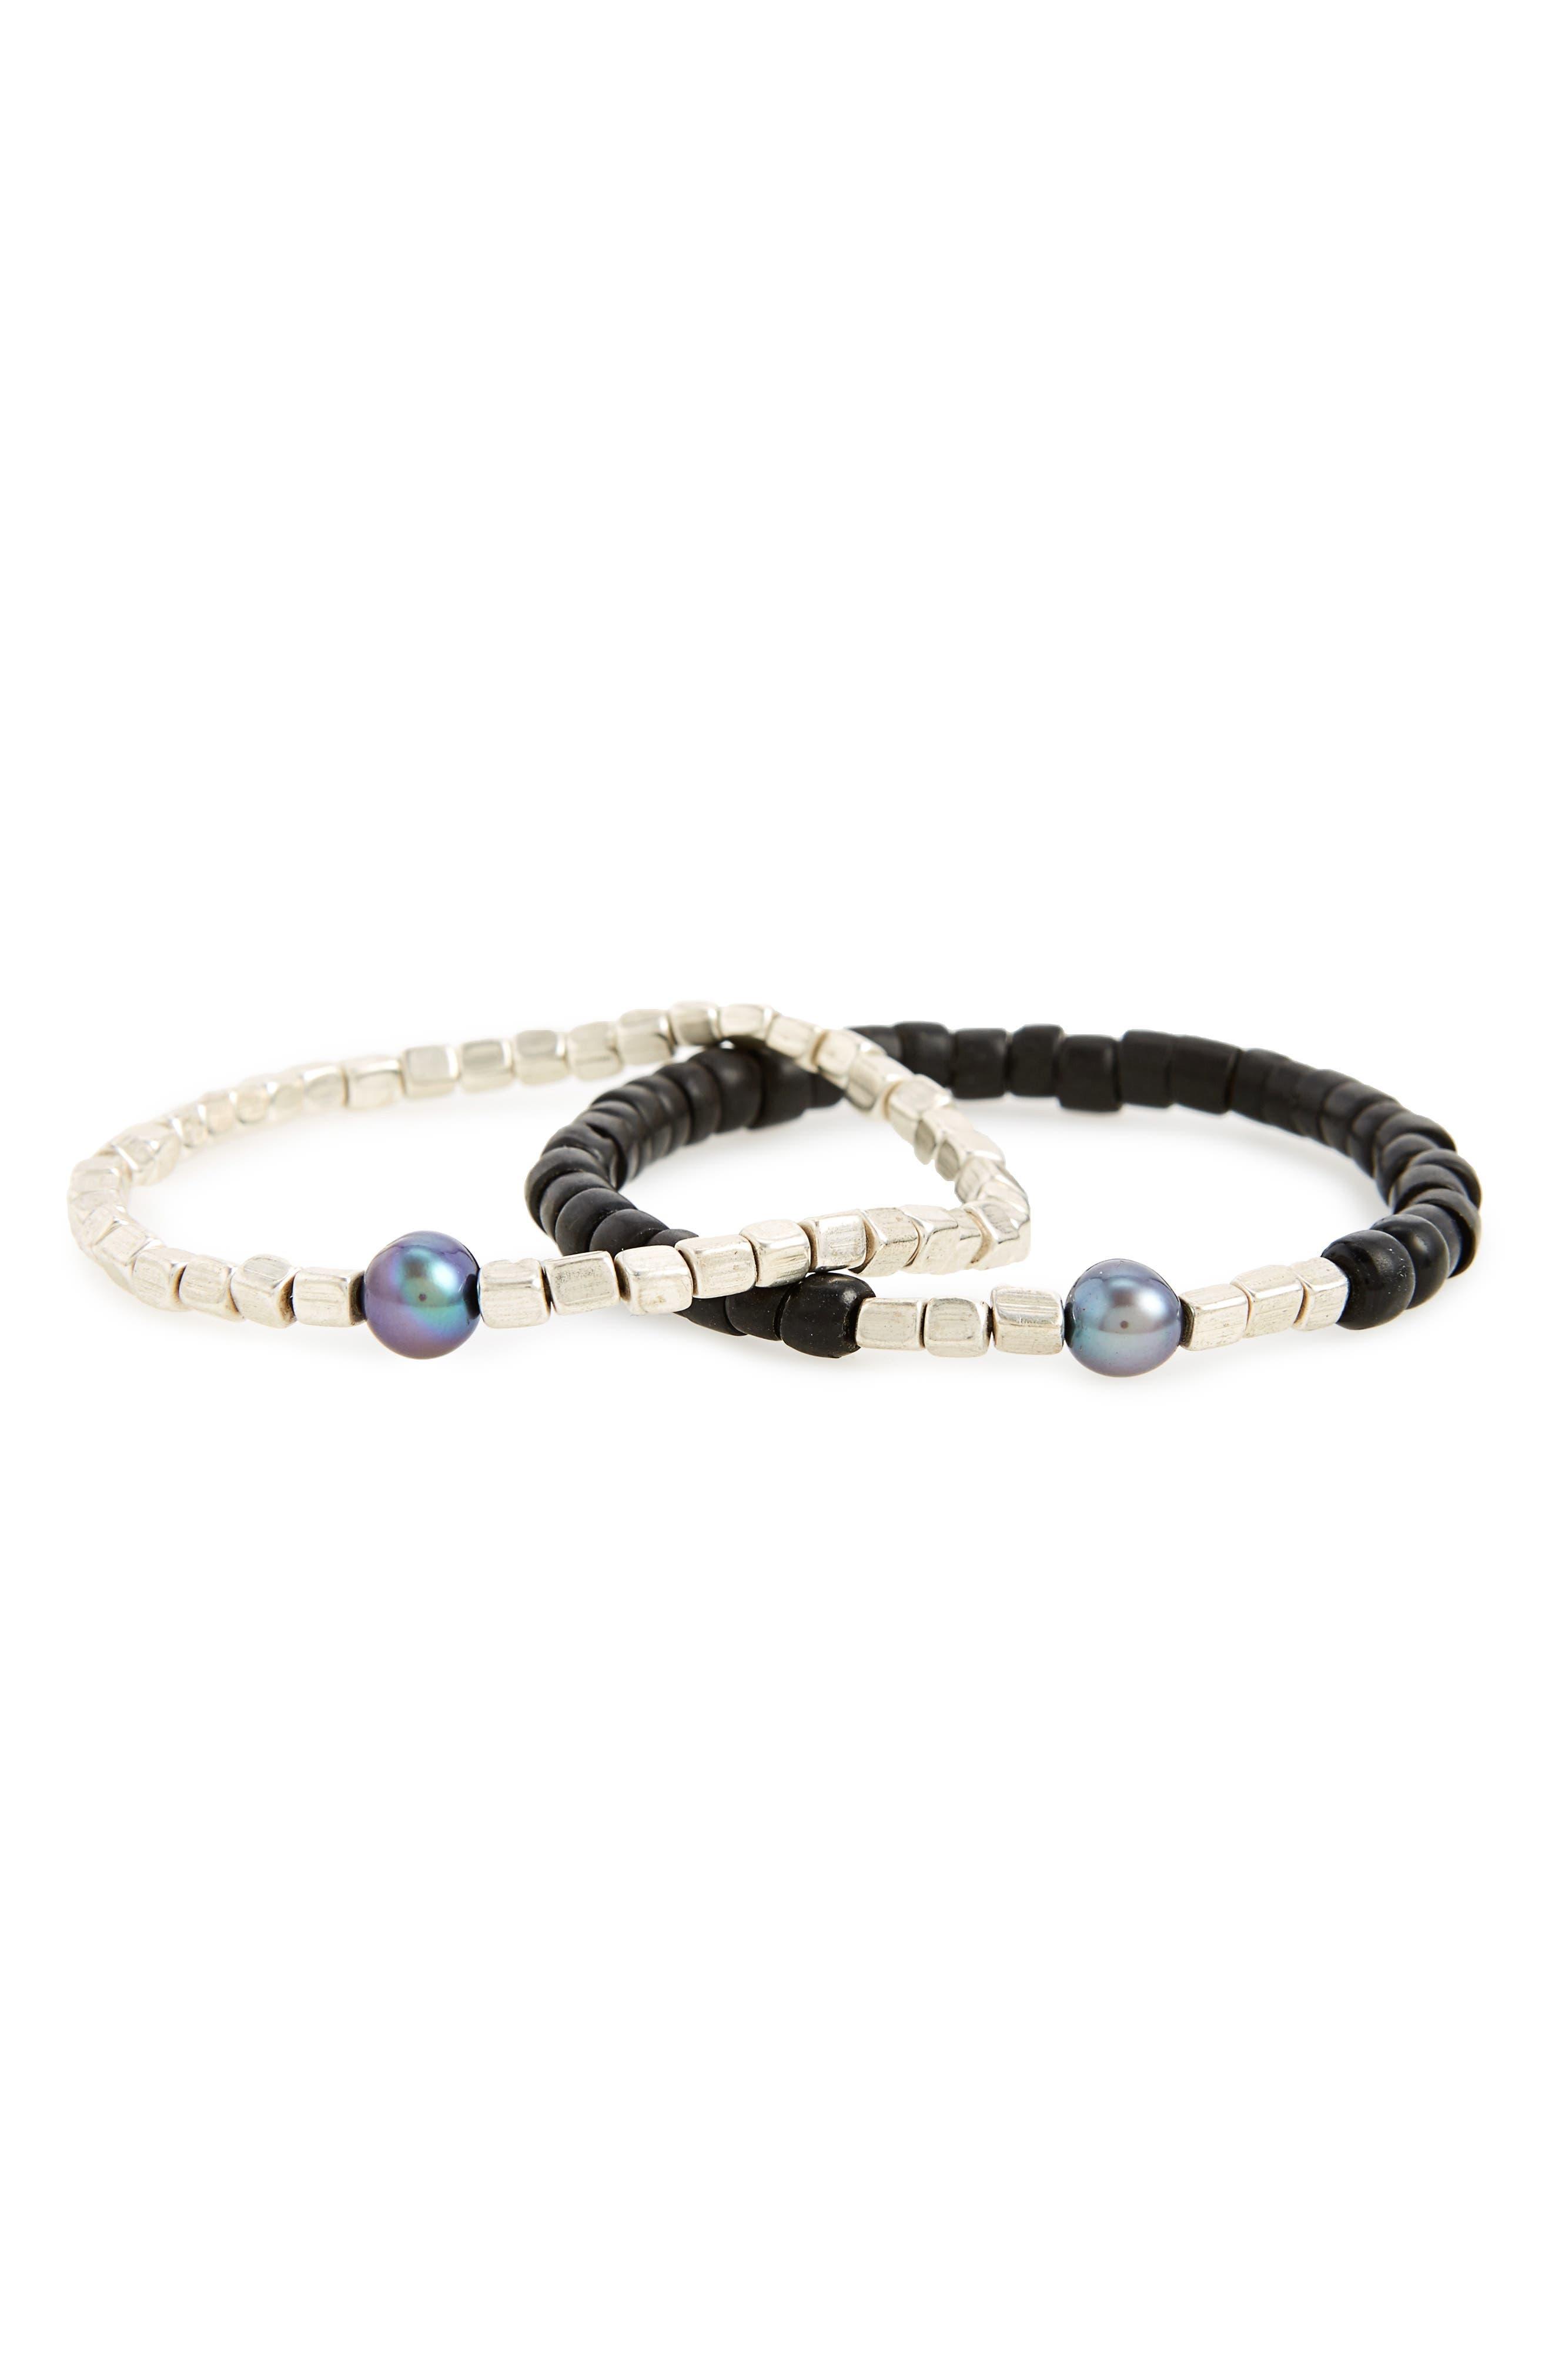 George Frost Essouira Shore Bead Bracelet Set